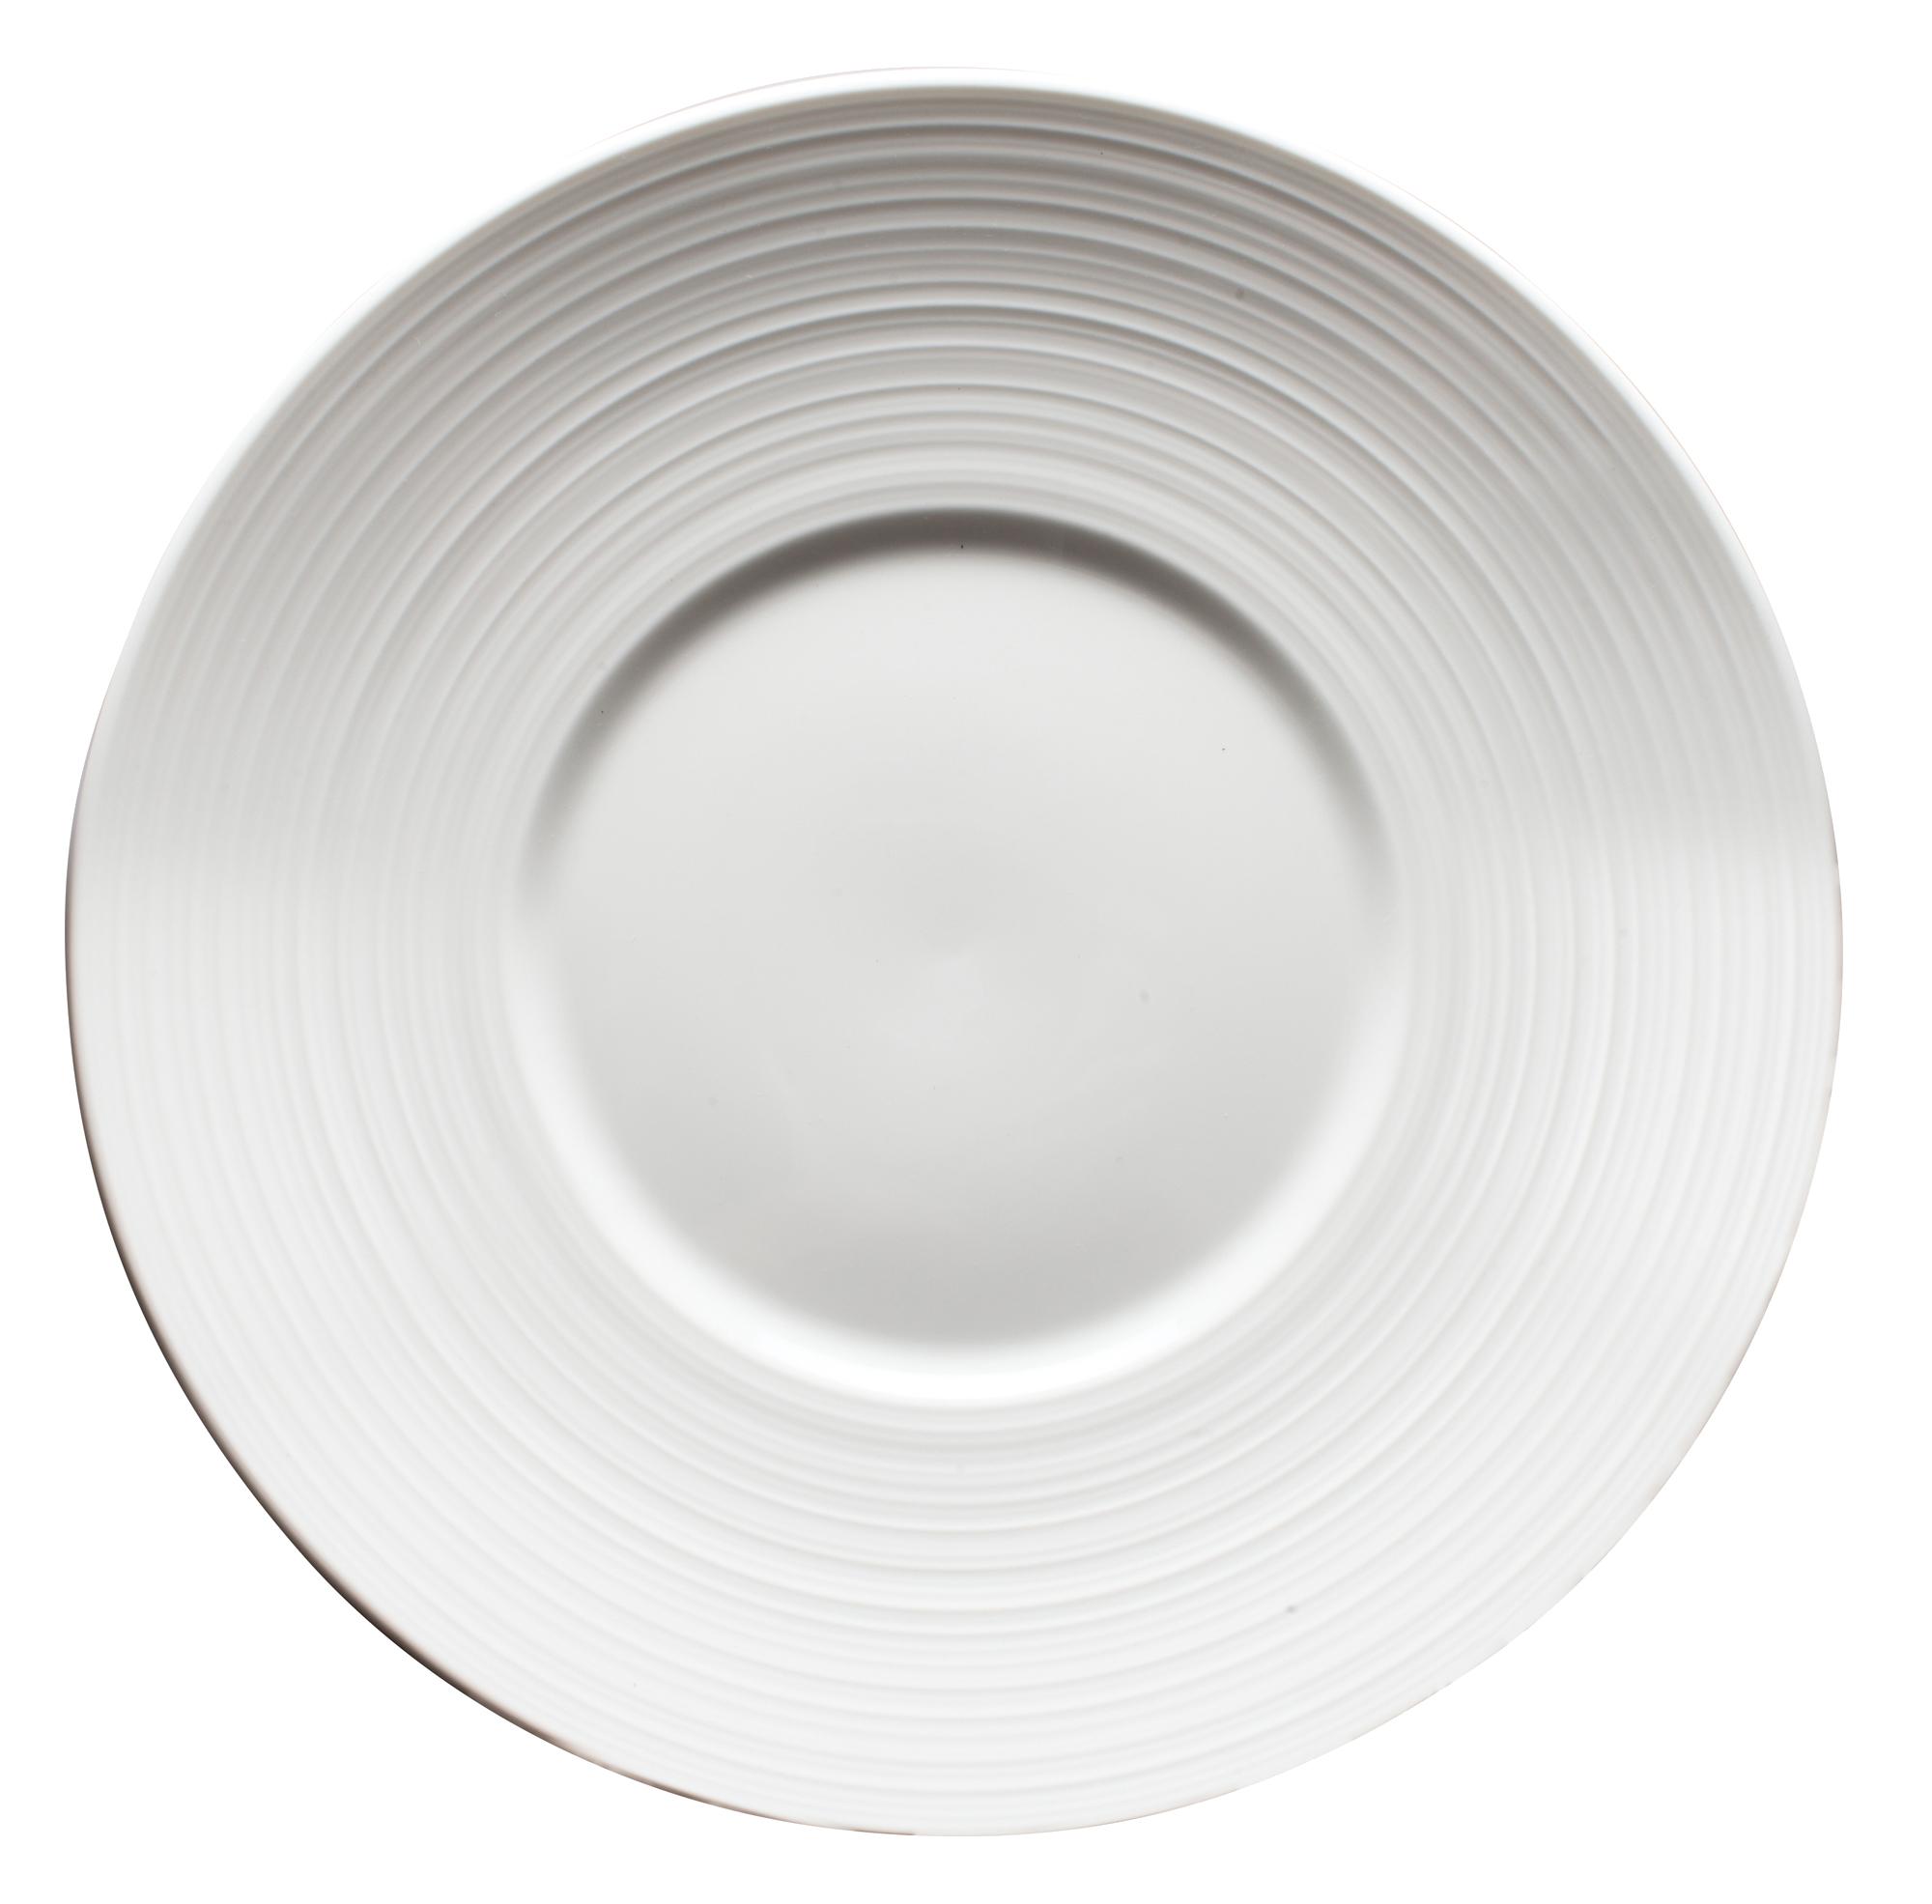 Winco WDP022-108 plate, china